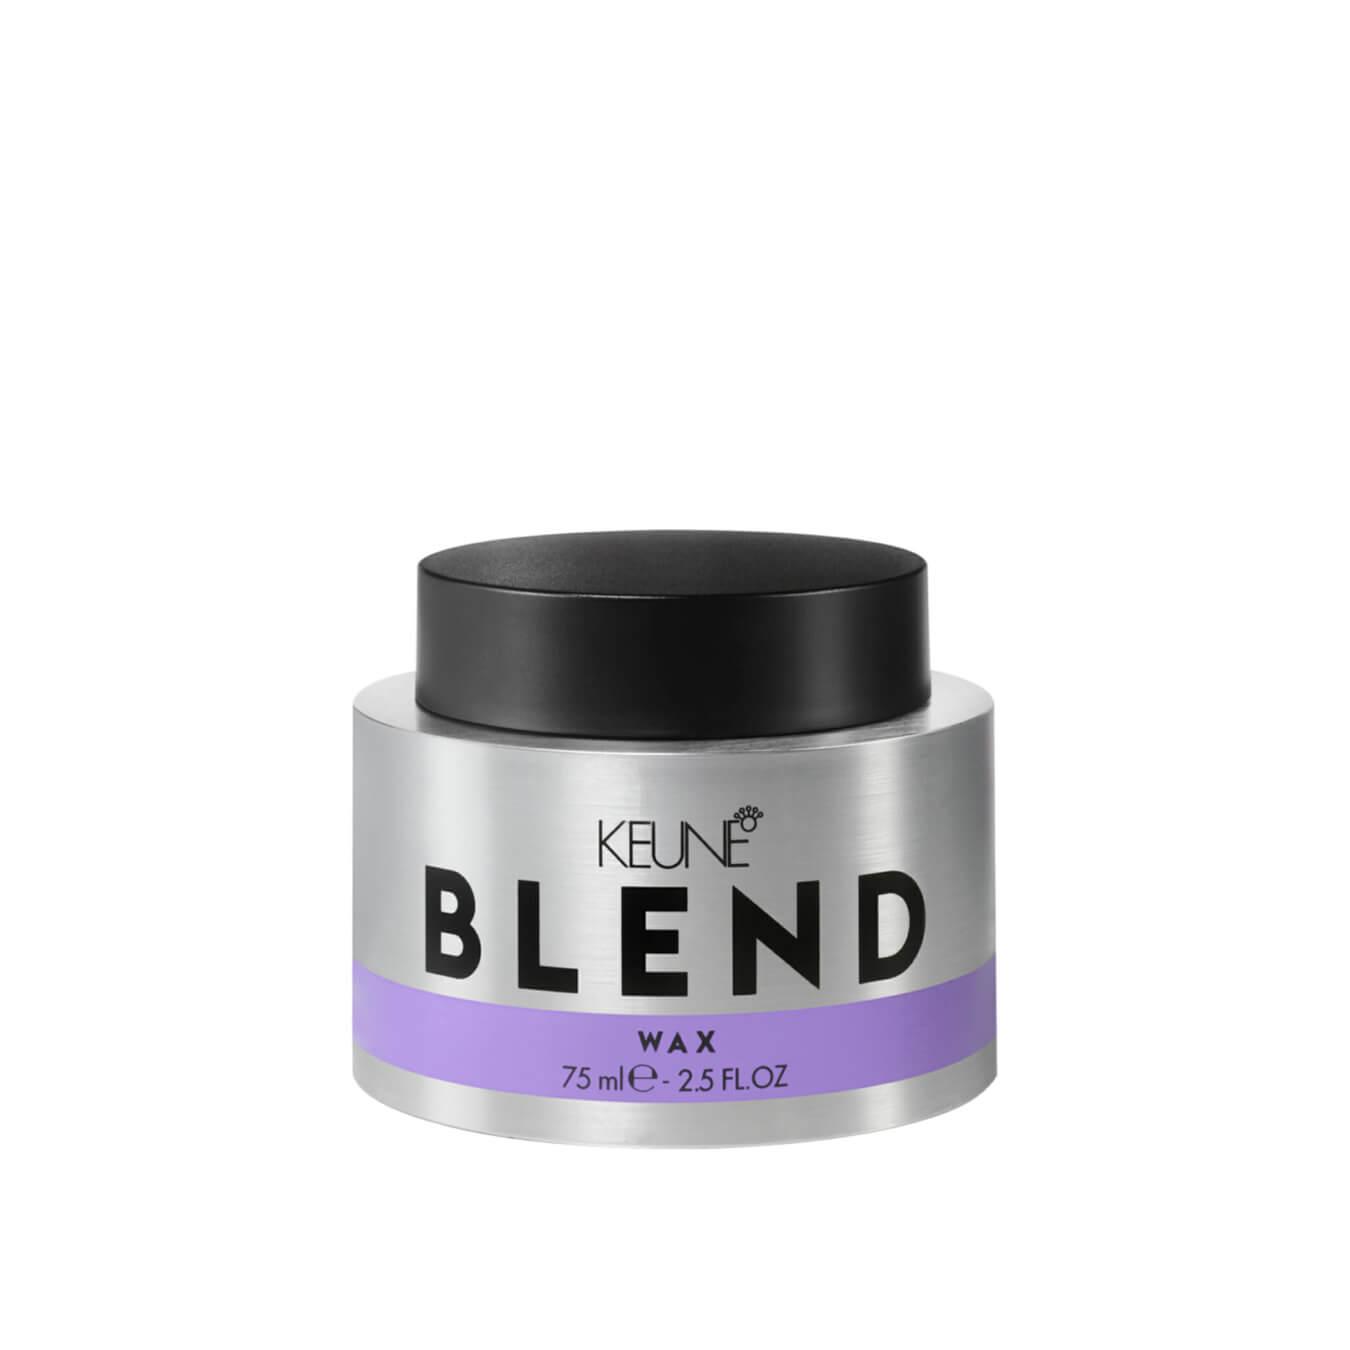 Kauf Keune Blend Wax 75ml